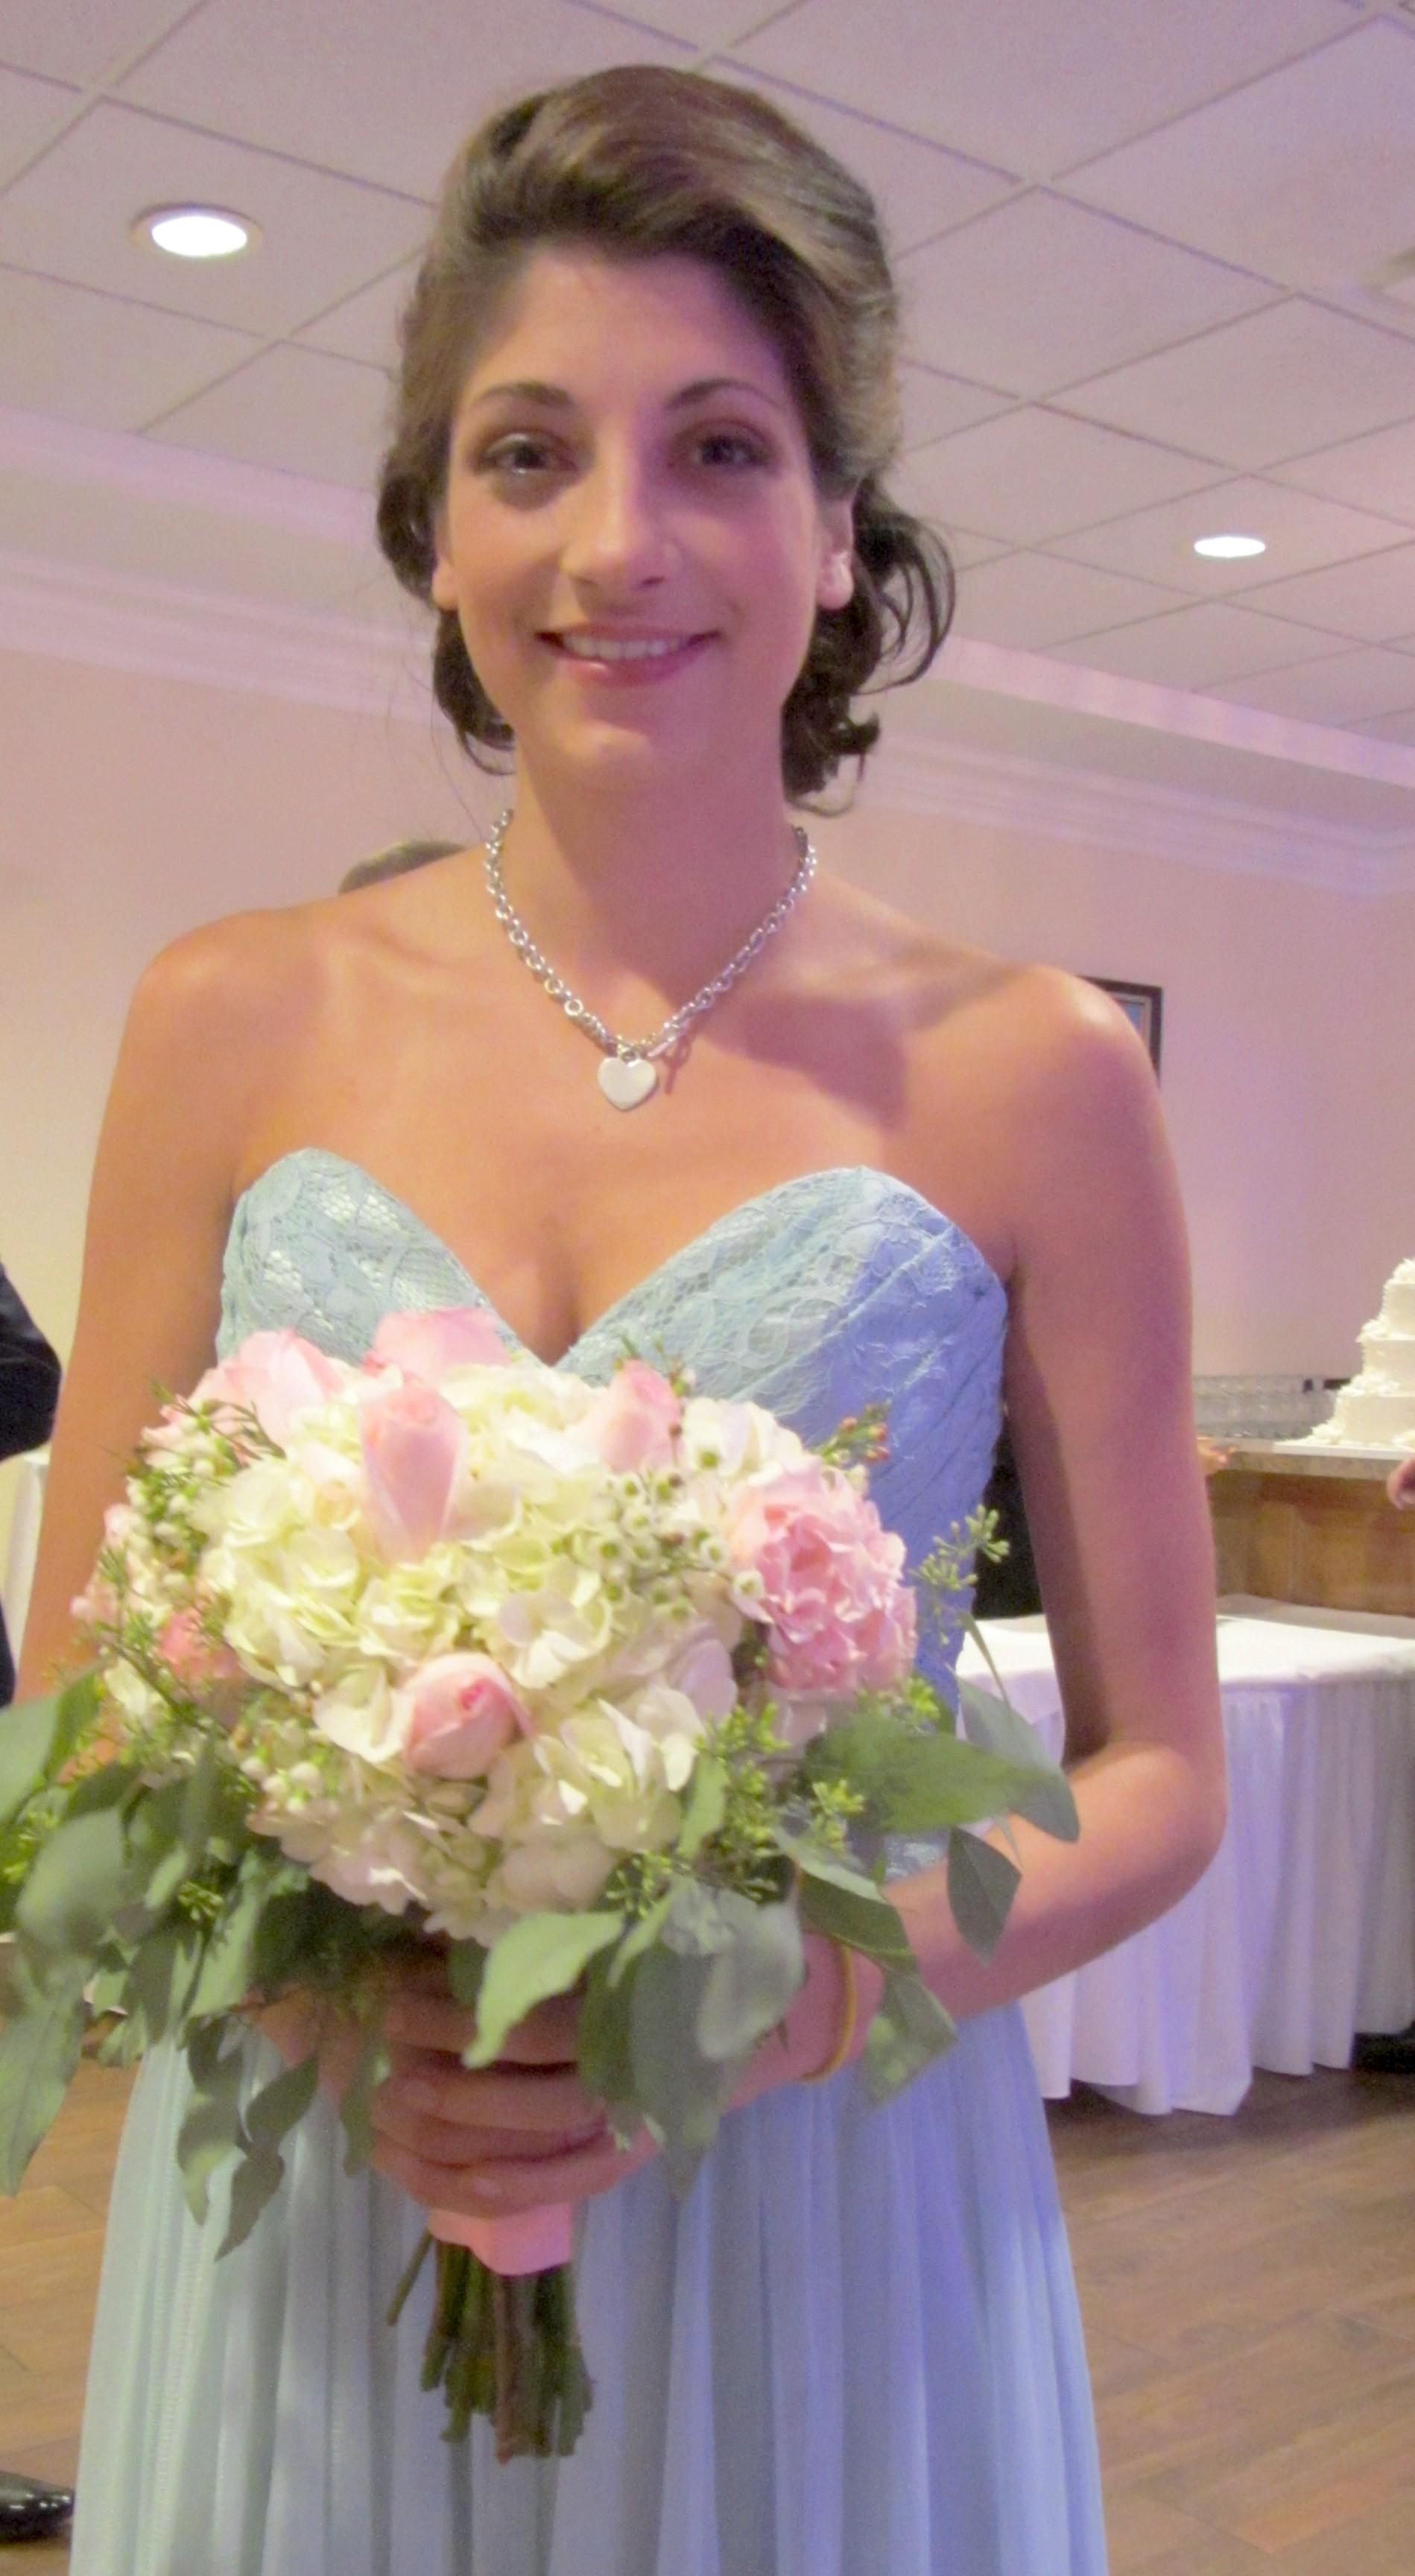 020 (2)Bridesmaid